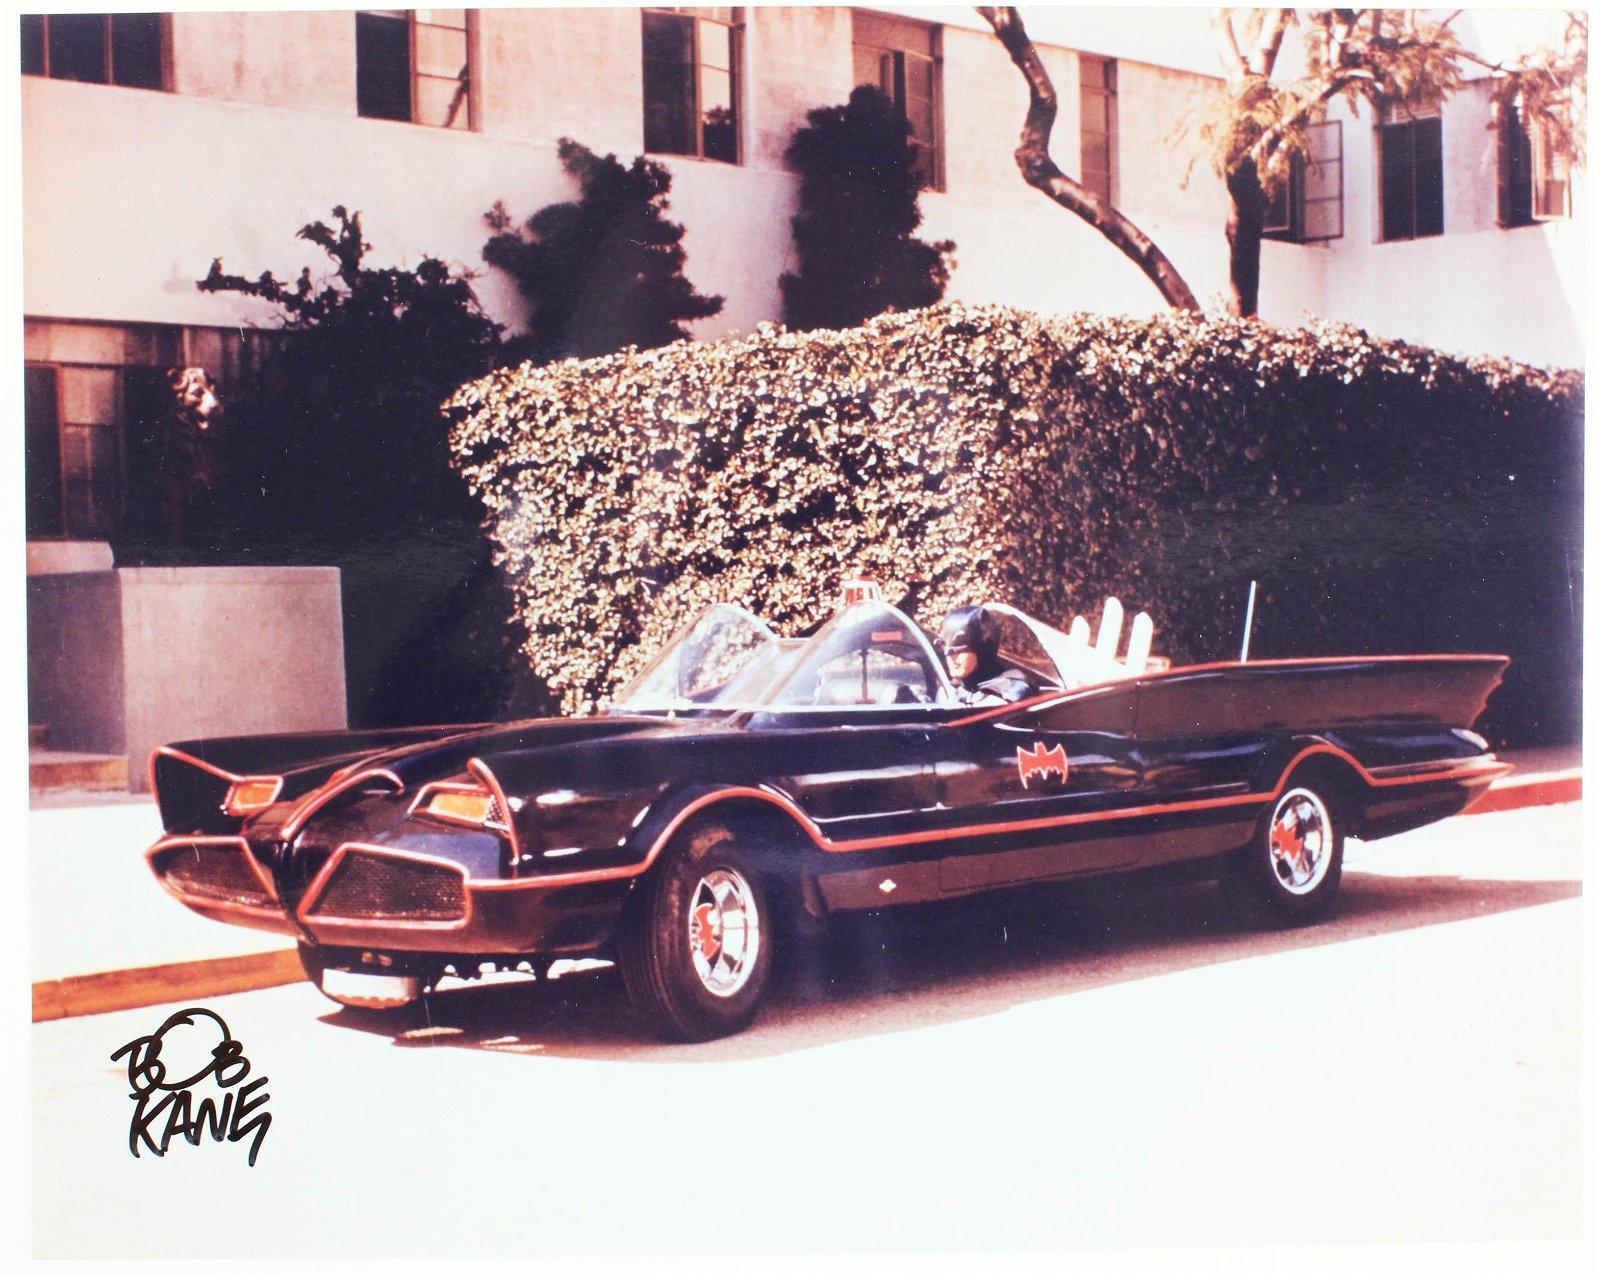 Bob Kane, Eli Wallach, Art Carney Batman Photos